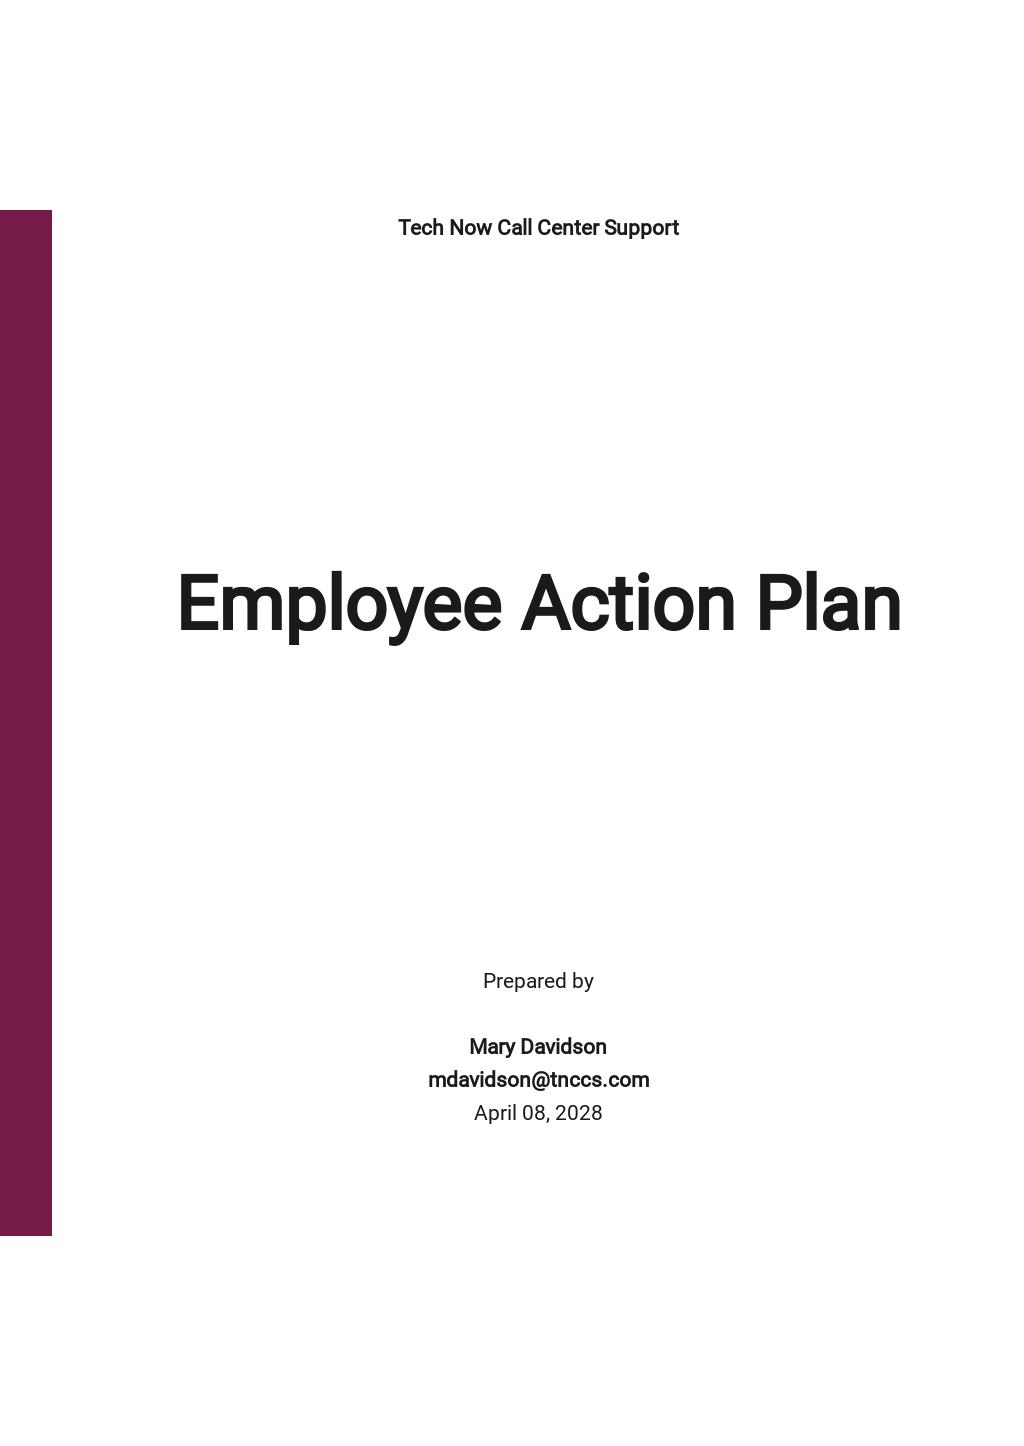 Sample Employee Action Plan Template.jpe